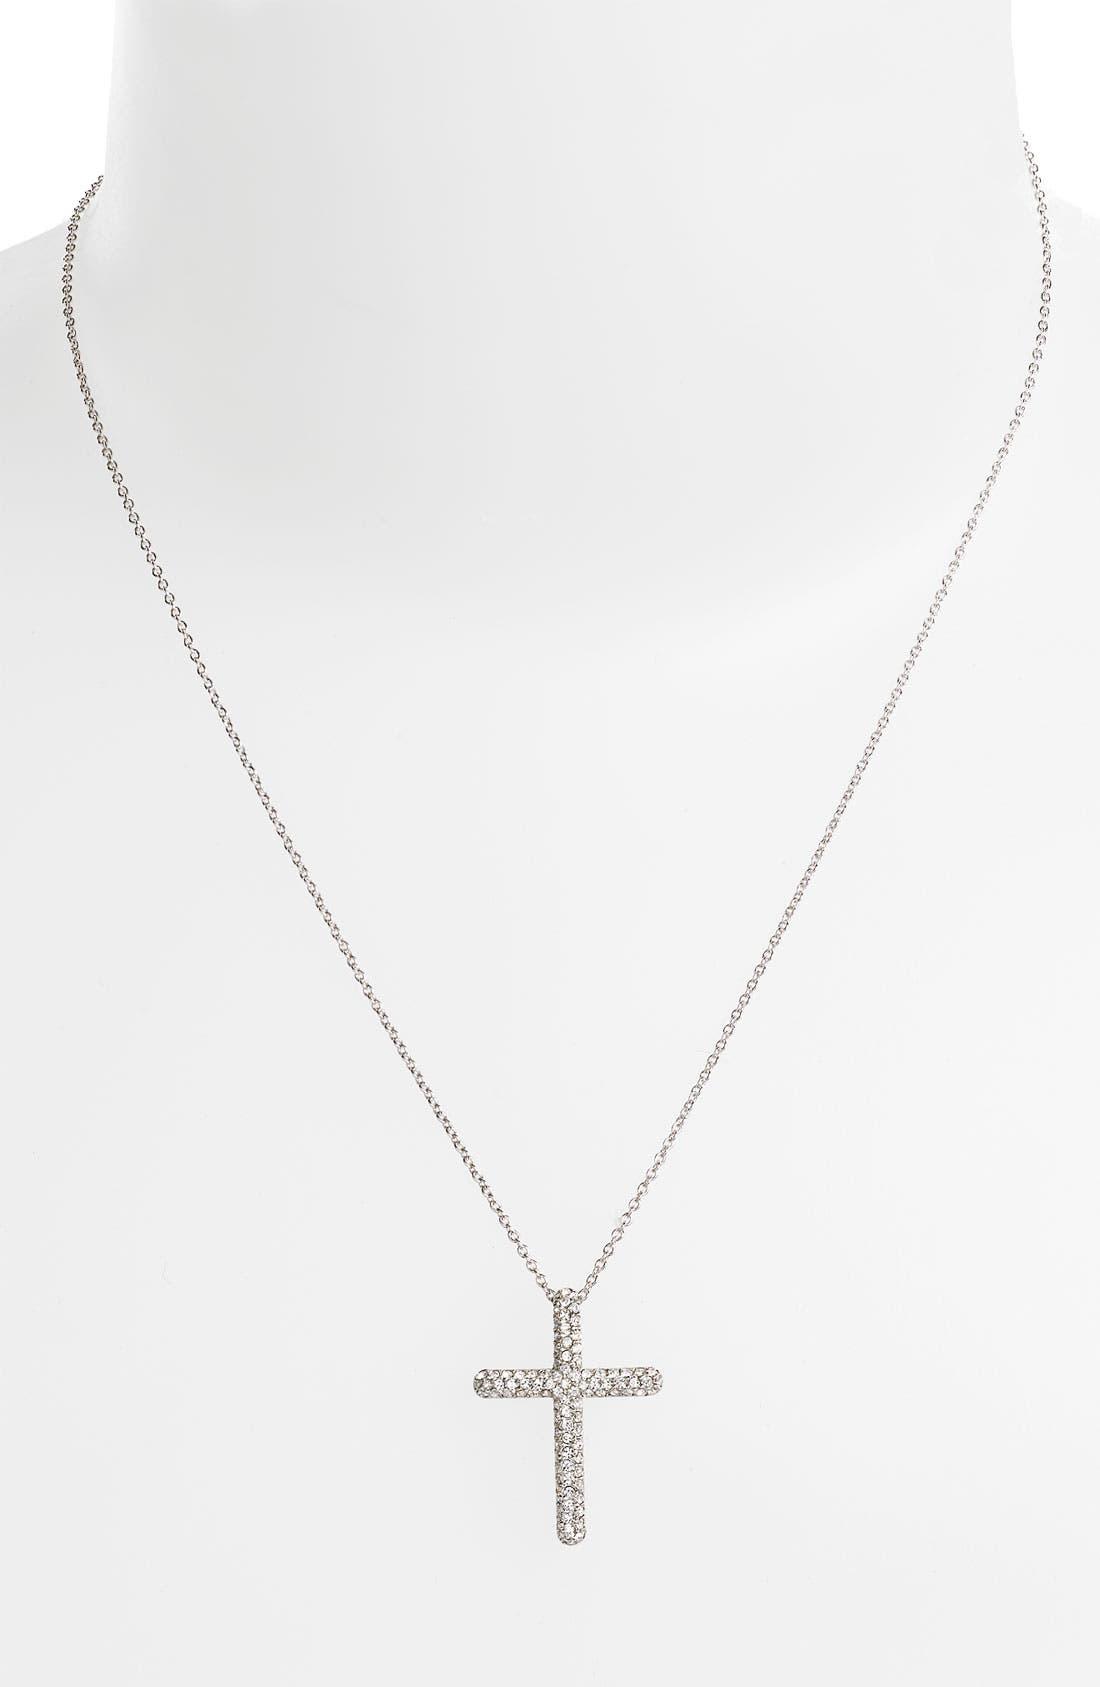 Alternate Image 1 Selected - Nadri Cross Pendant Necklace (Nordstrom Exclusive)